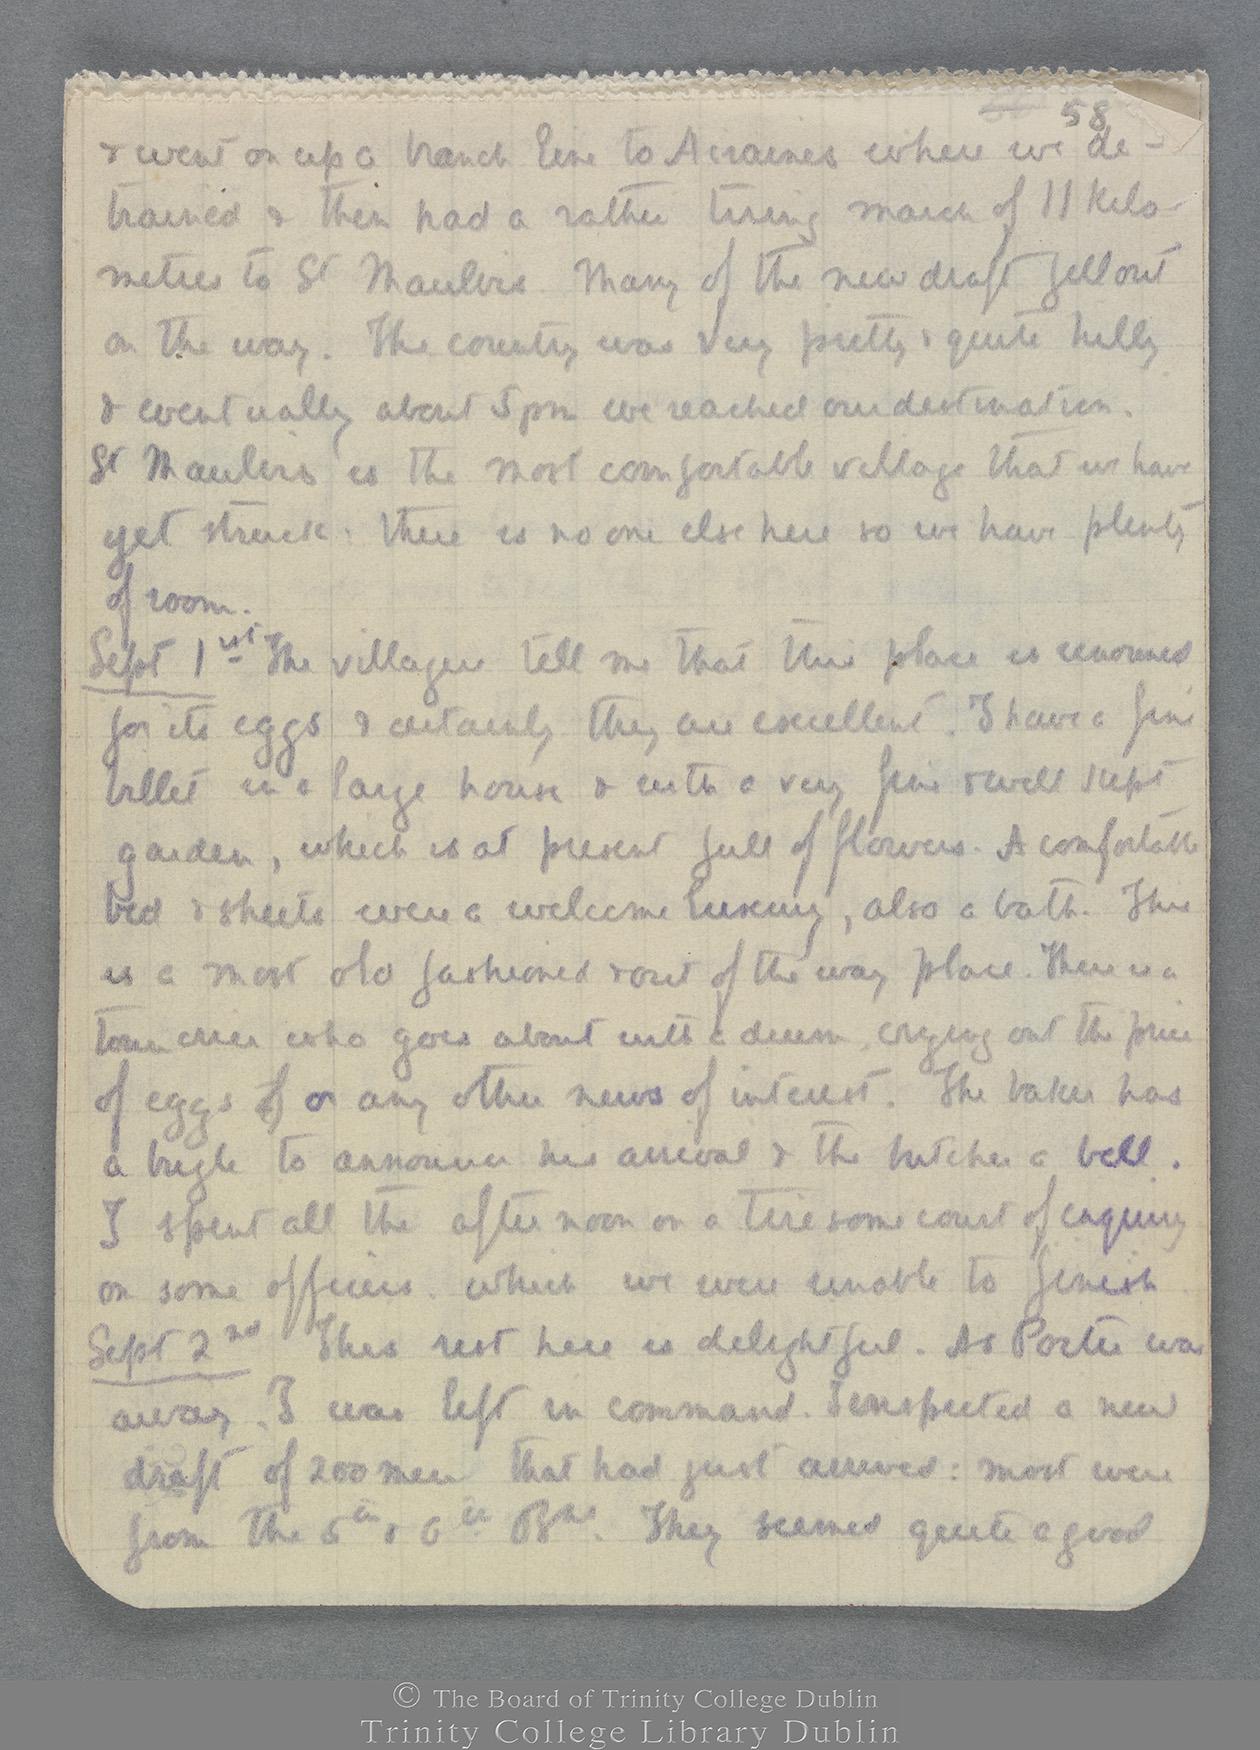 TCD MS 10821 folio 58 recto